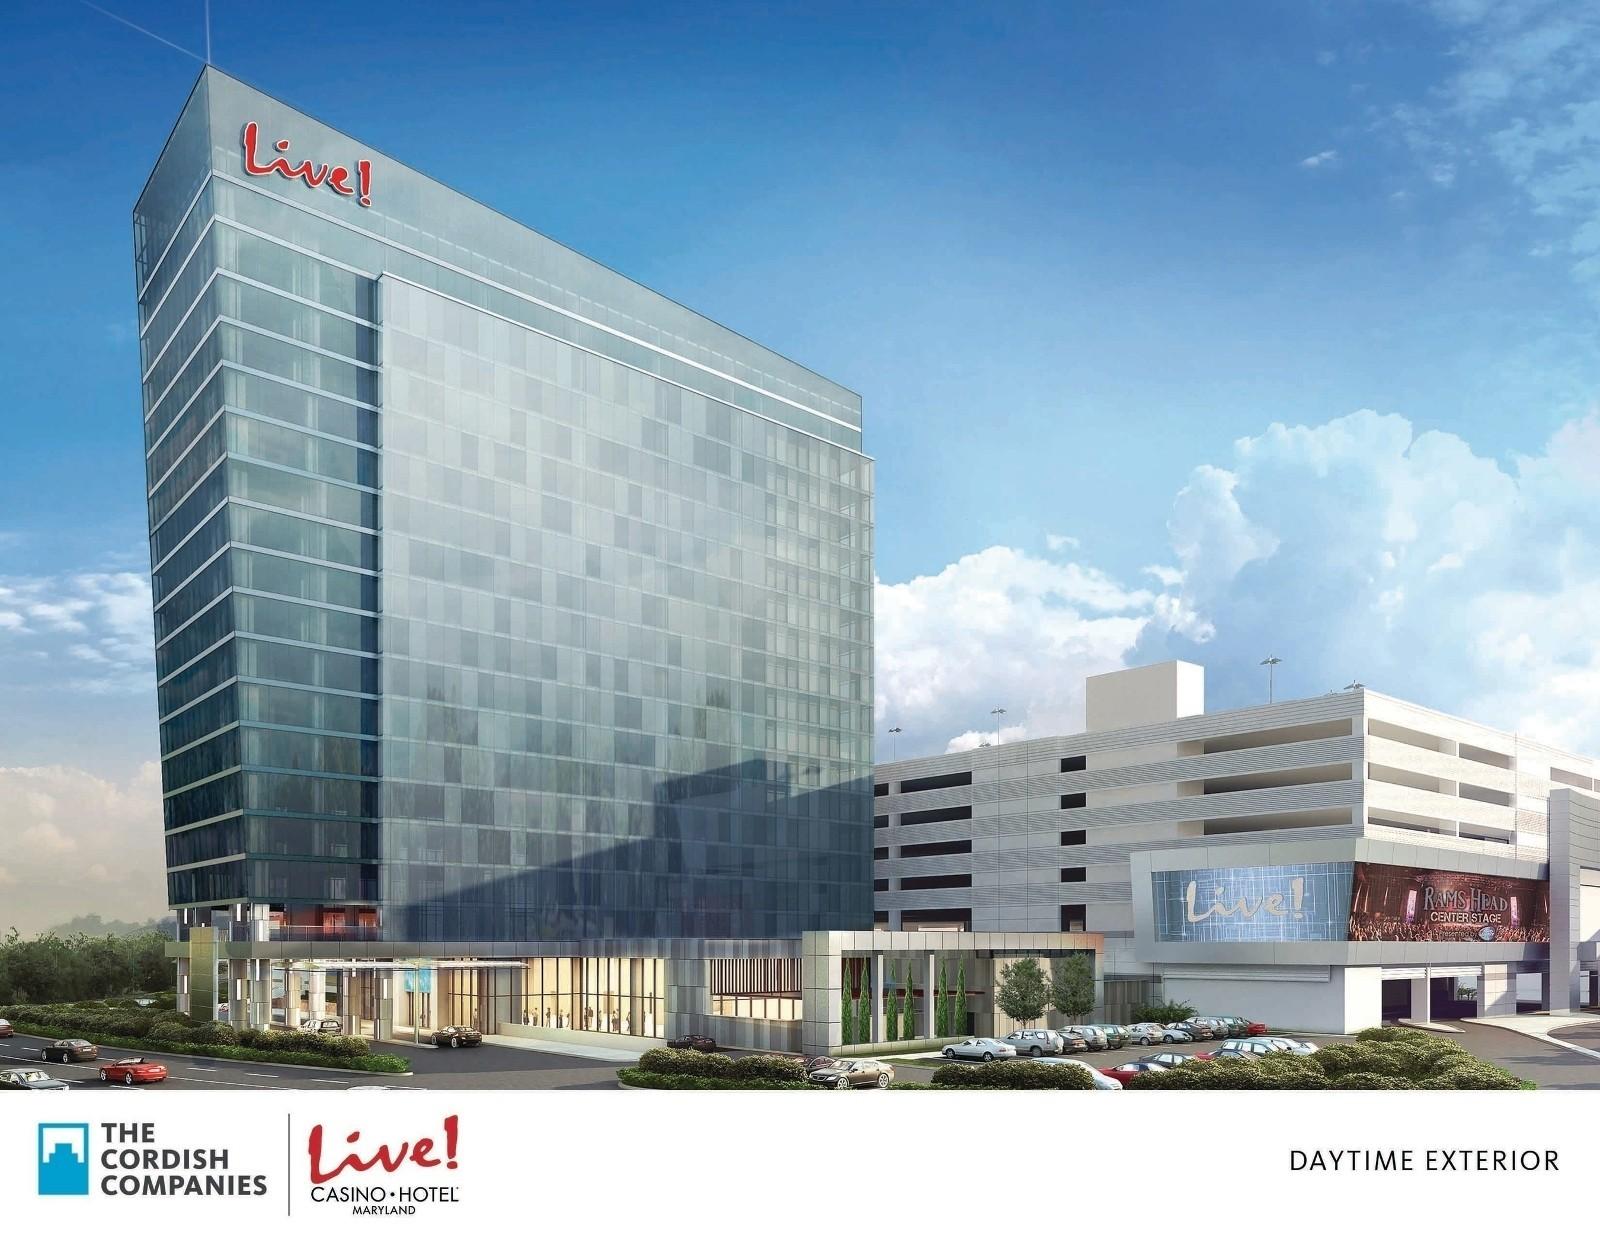 Maryland live casino hotels